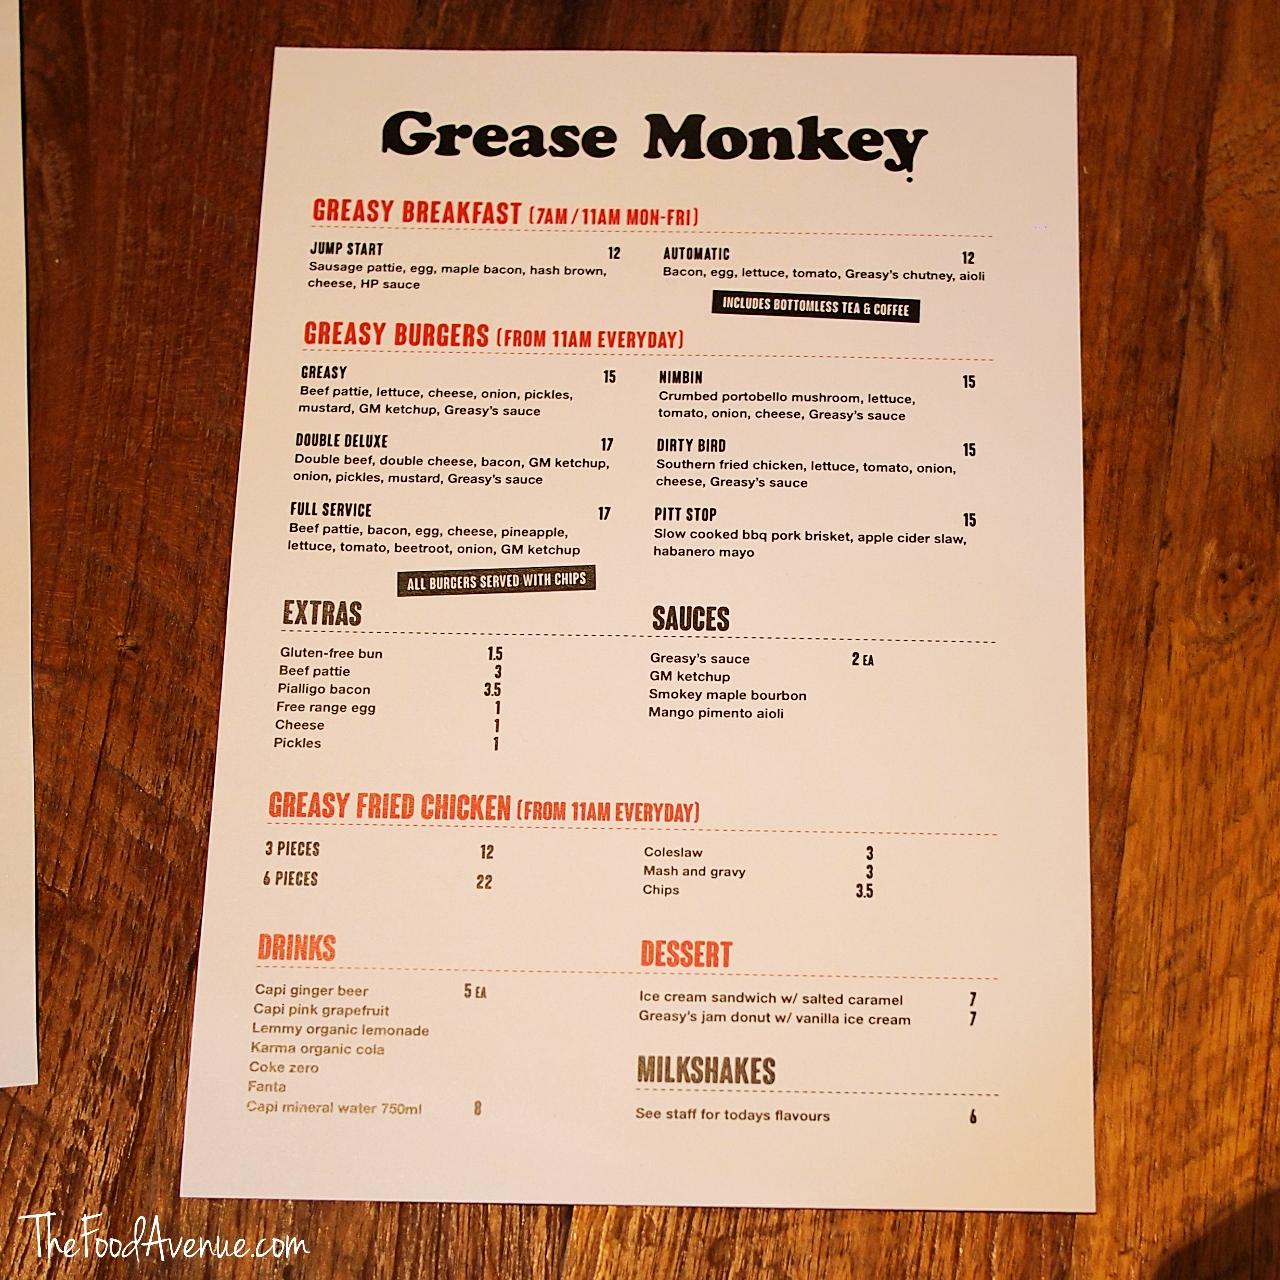 The_Food_Avenue_Grease_Monkey_menu